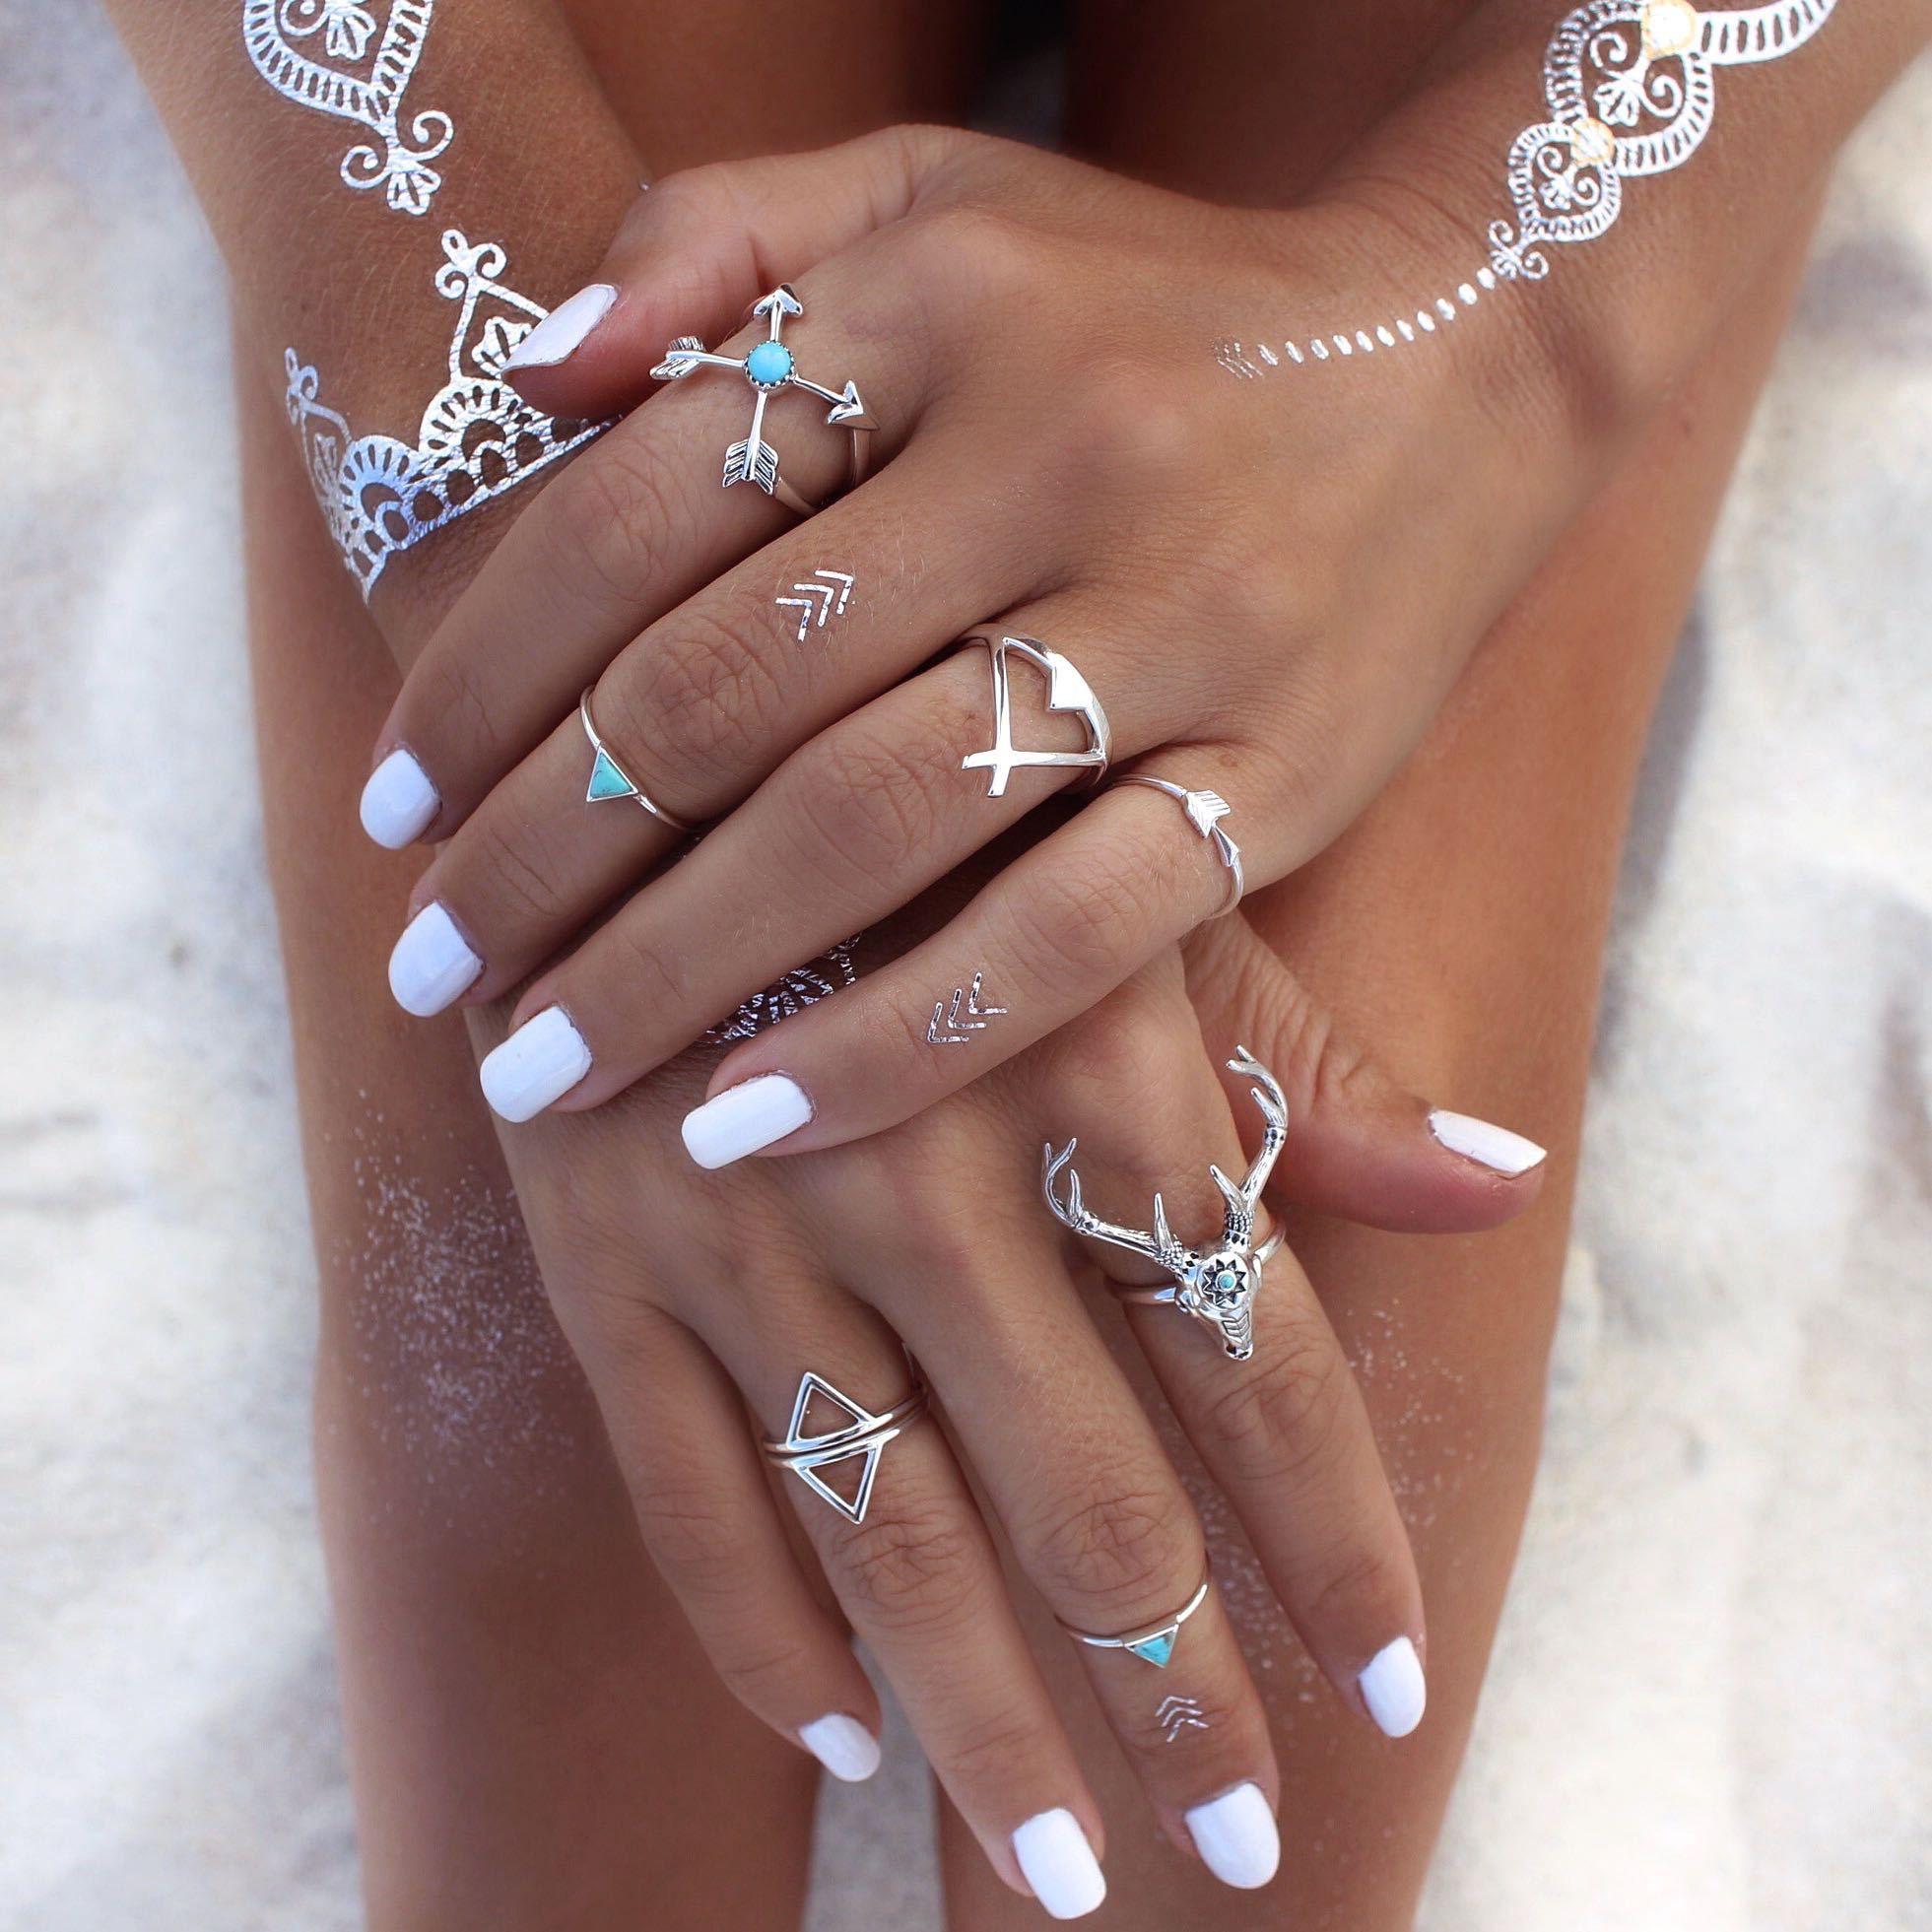 Natural simple summer beach boho diy nail art designs